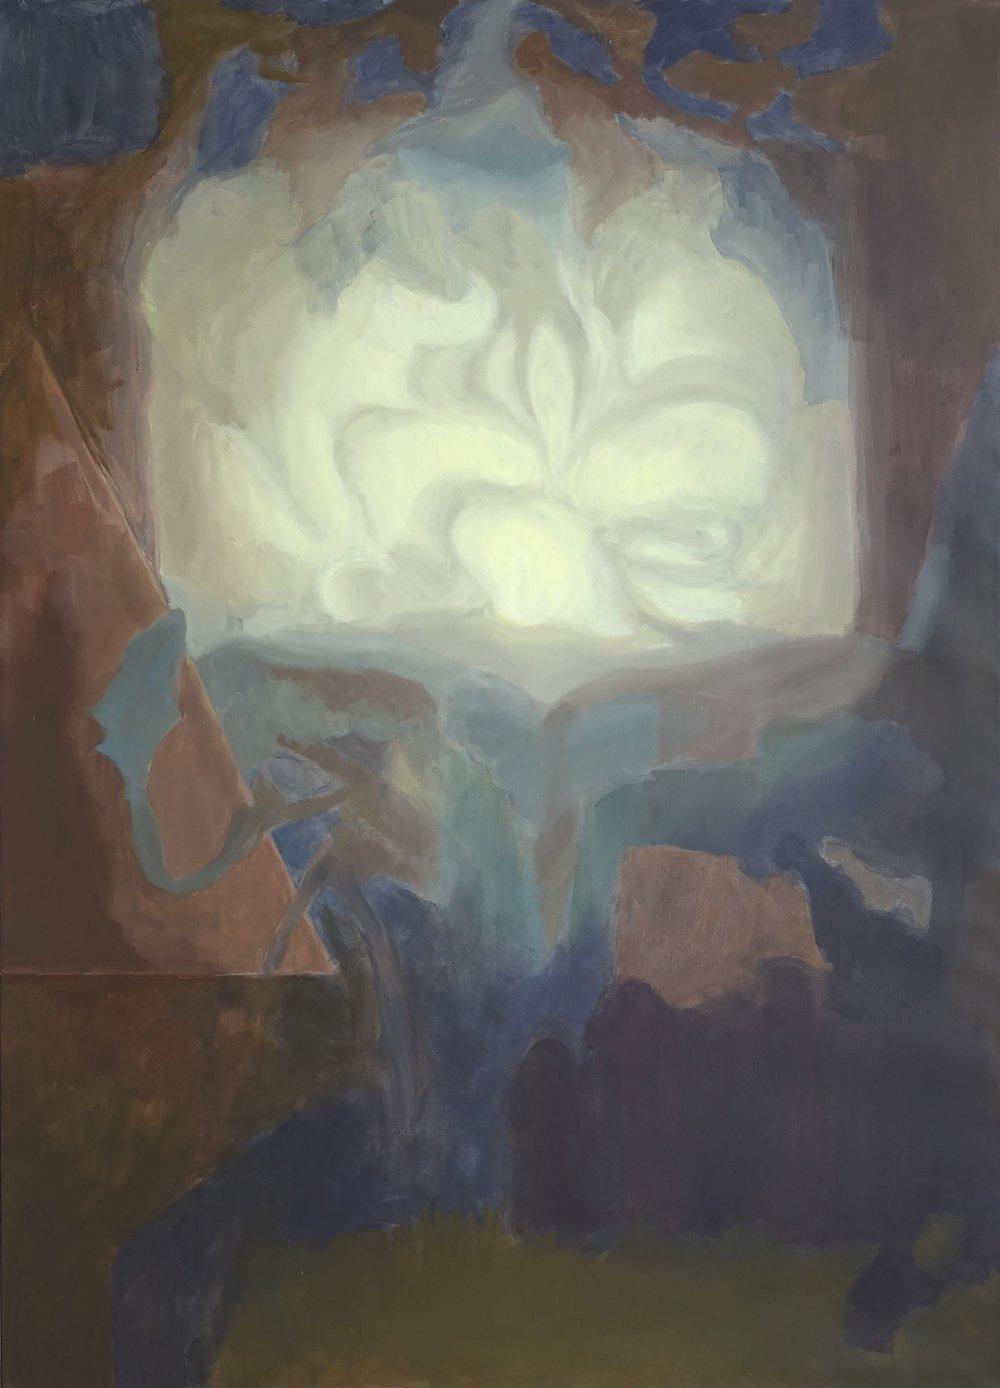 Untitled (Zh), (2018)